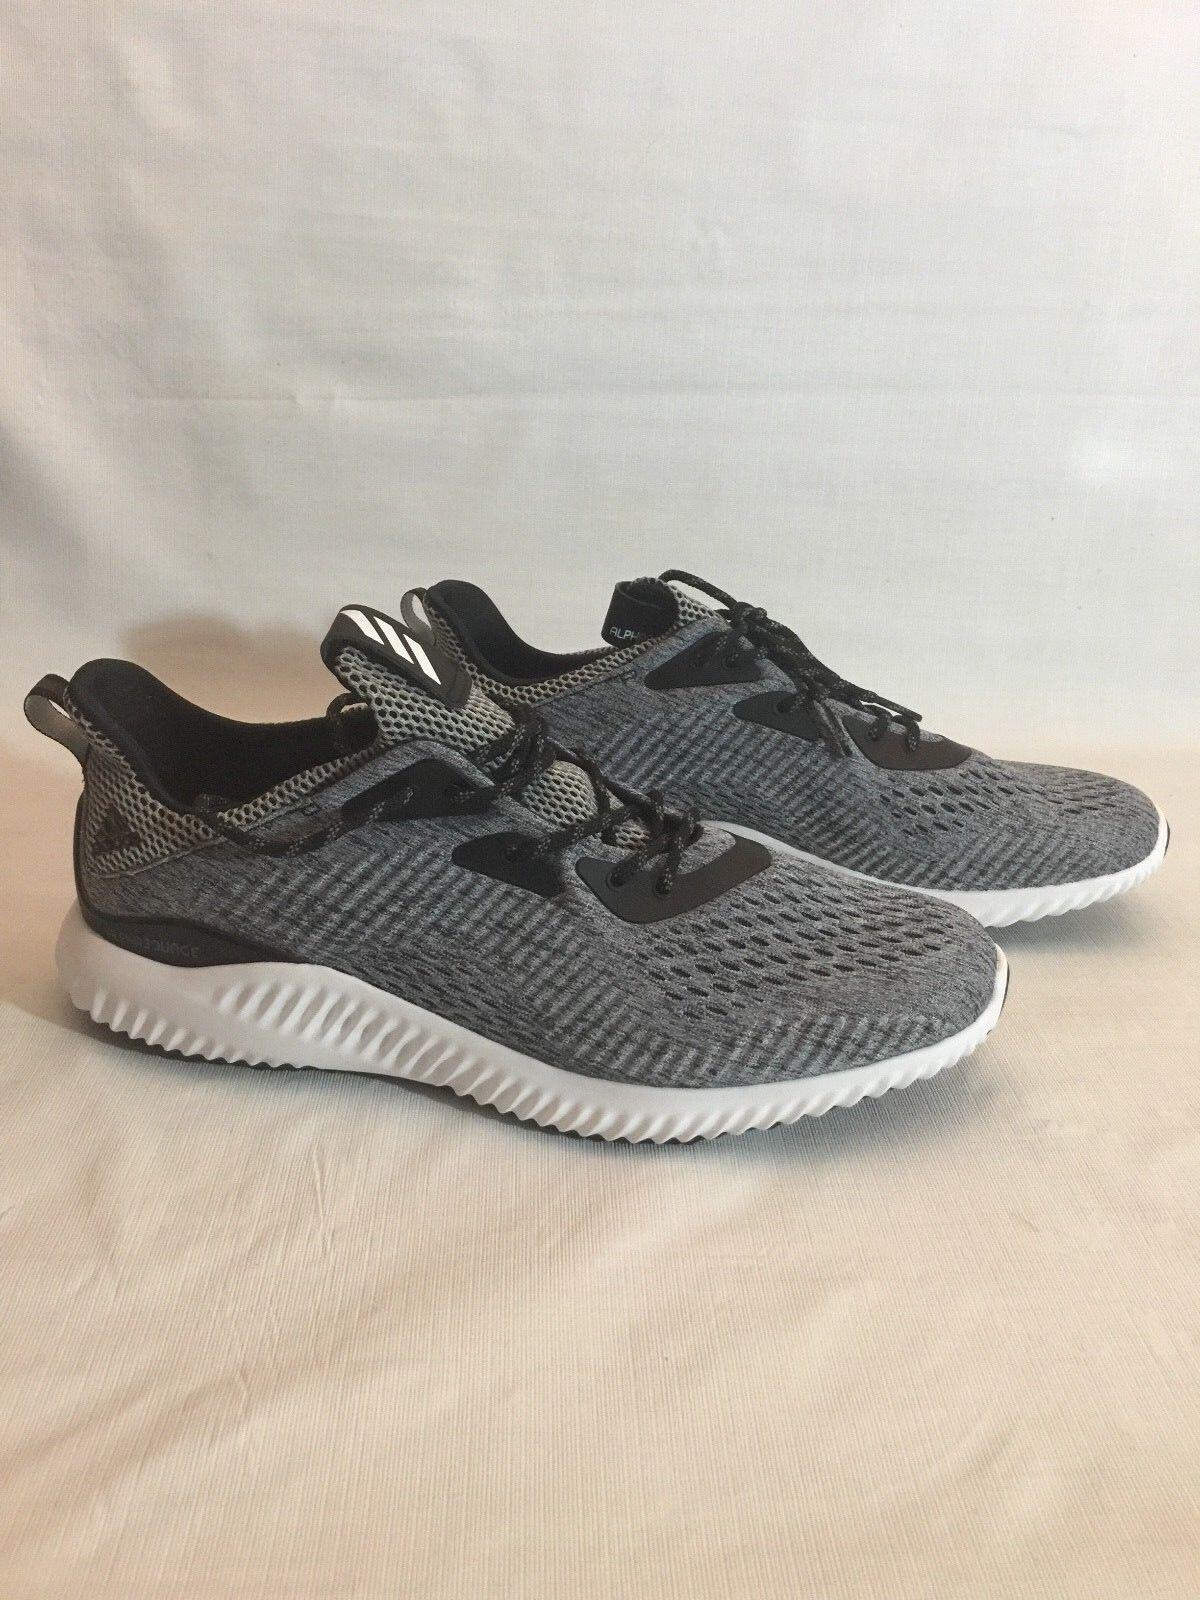 Adidas Alphabounce Men's Größe 12